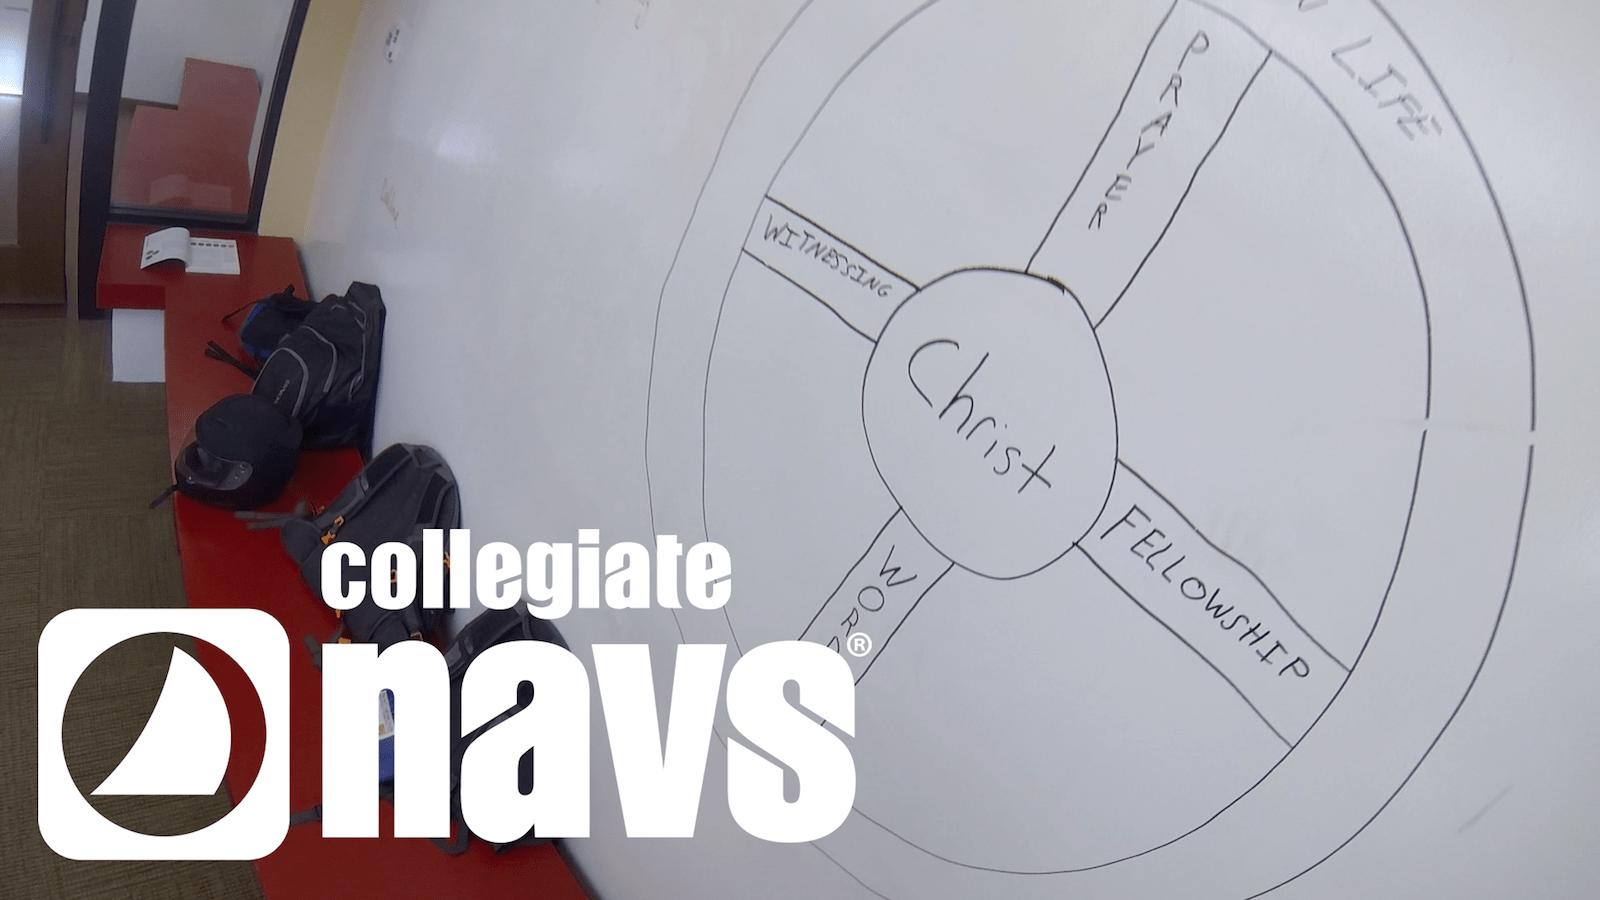 Collegiate Navs Commercial